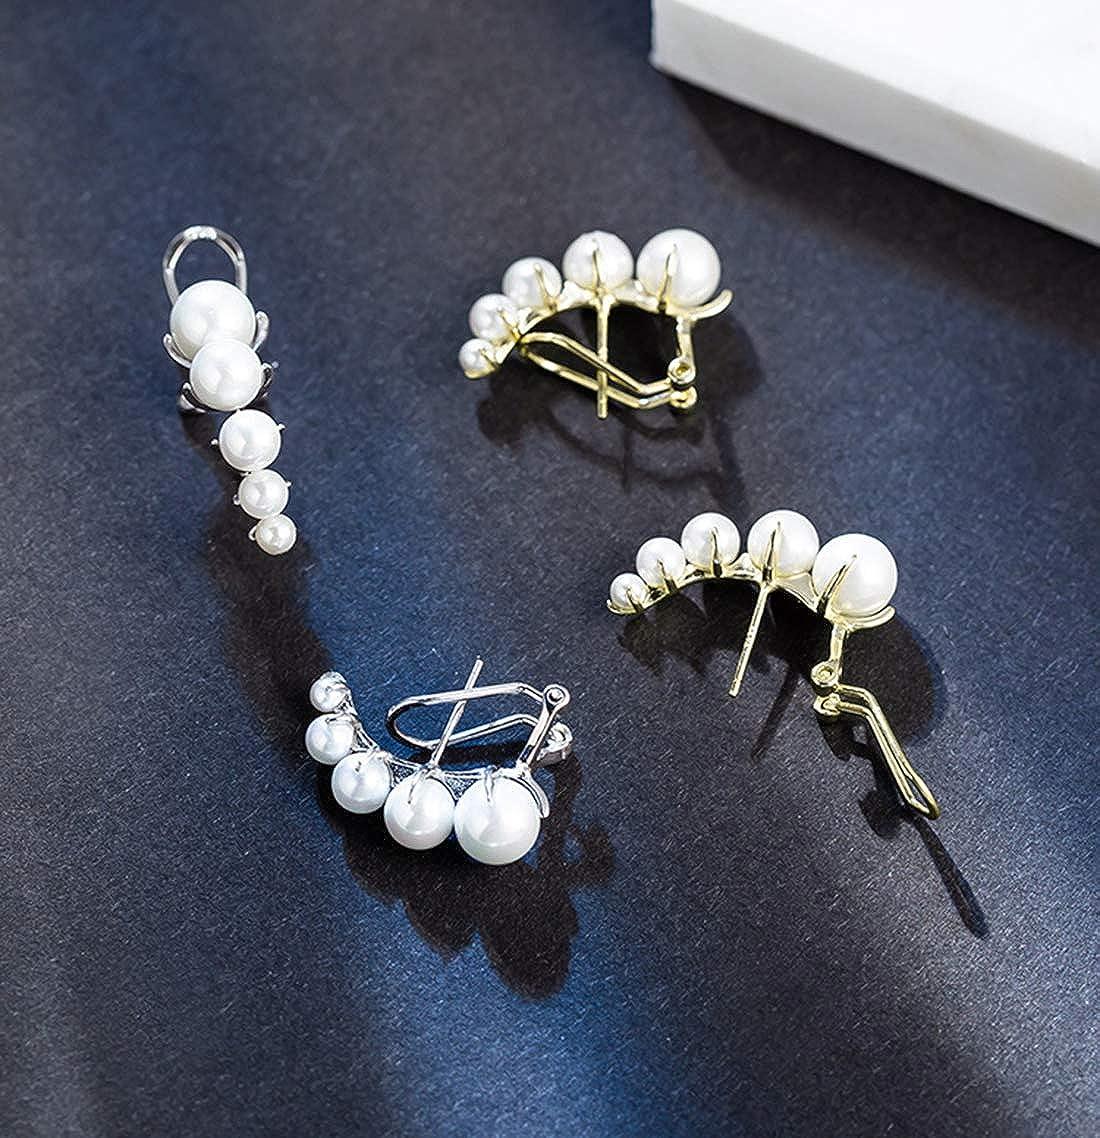 SLUYNZ 925 Sterling Silver Shell Pearl Crawler Earrings Cuff for Women Yellow Gold Clip Ons Earrings